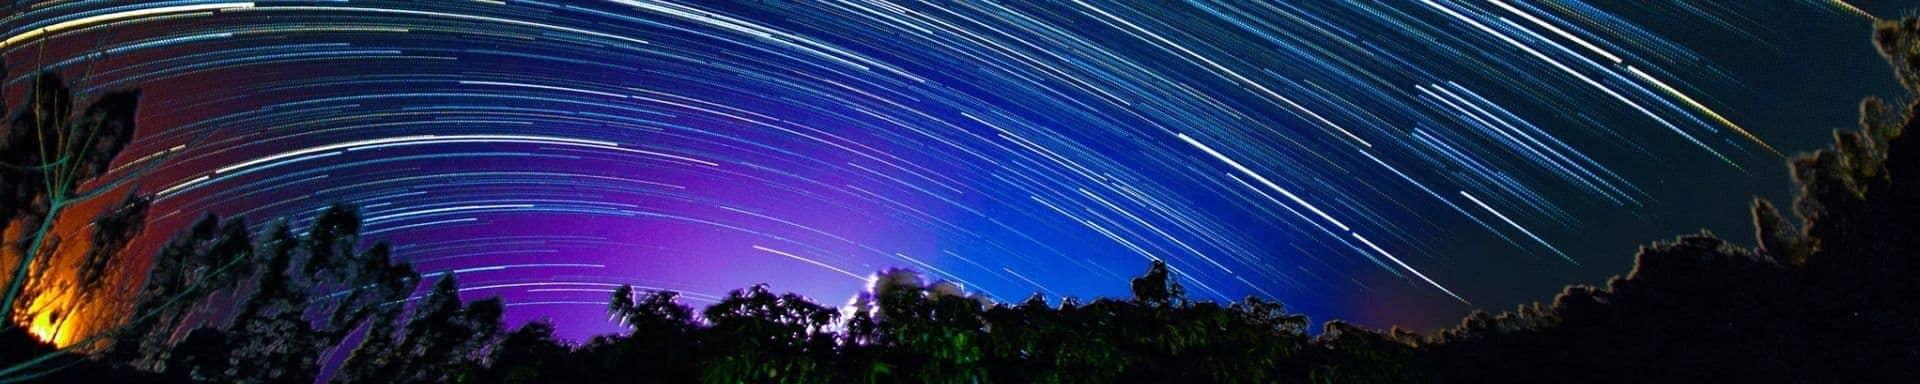 Time lapse do ceu noturno